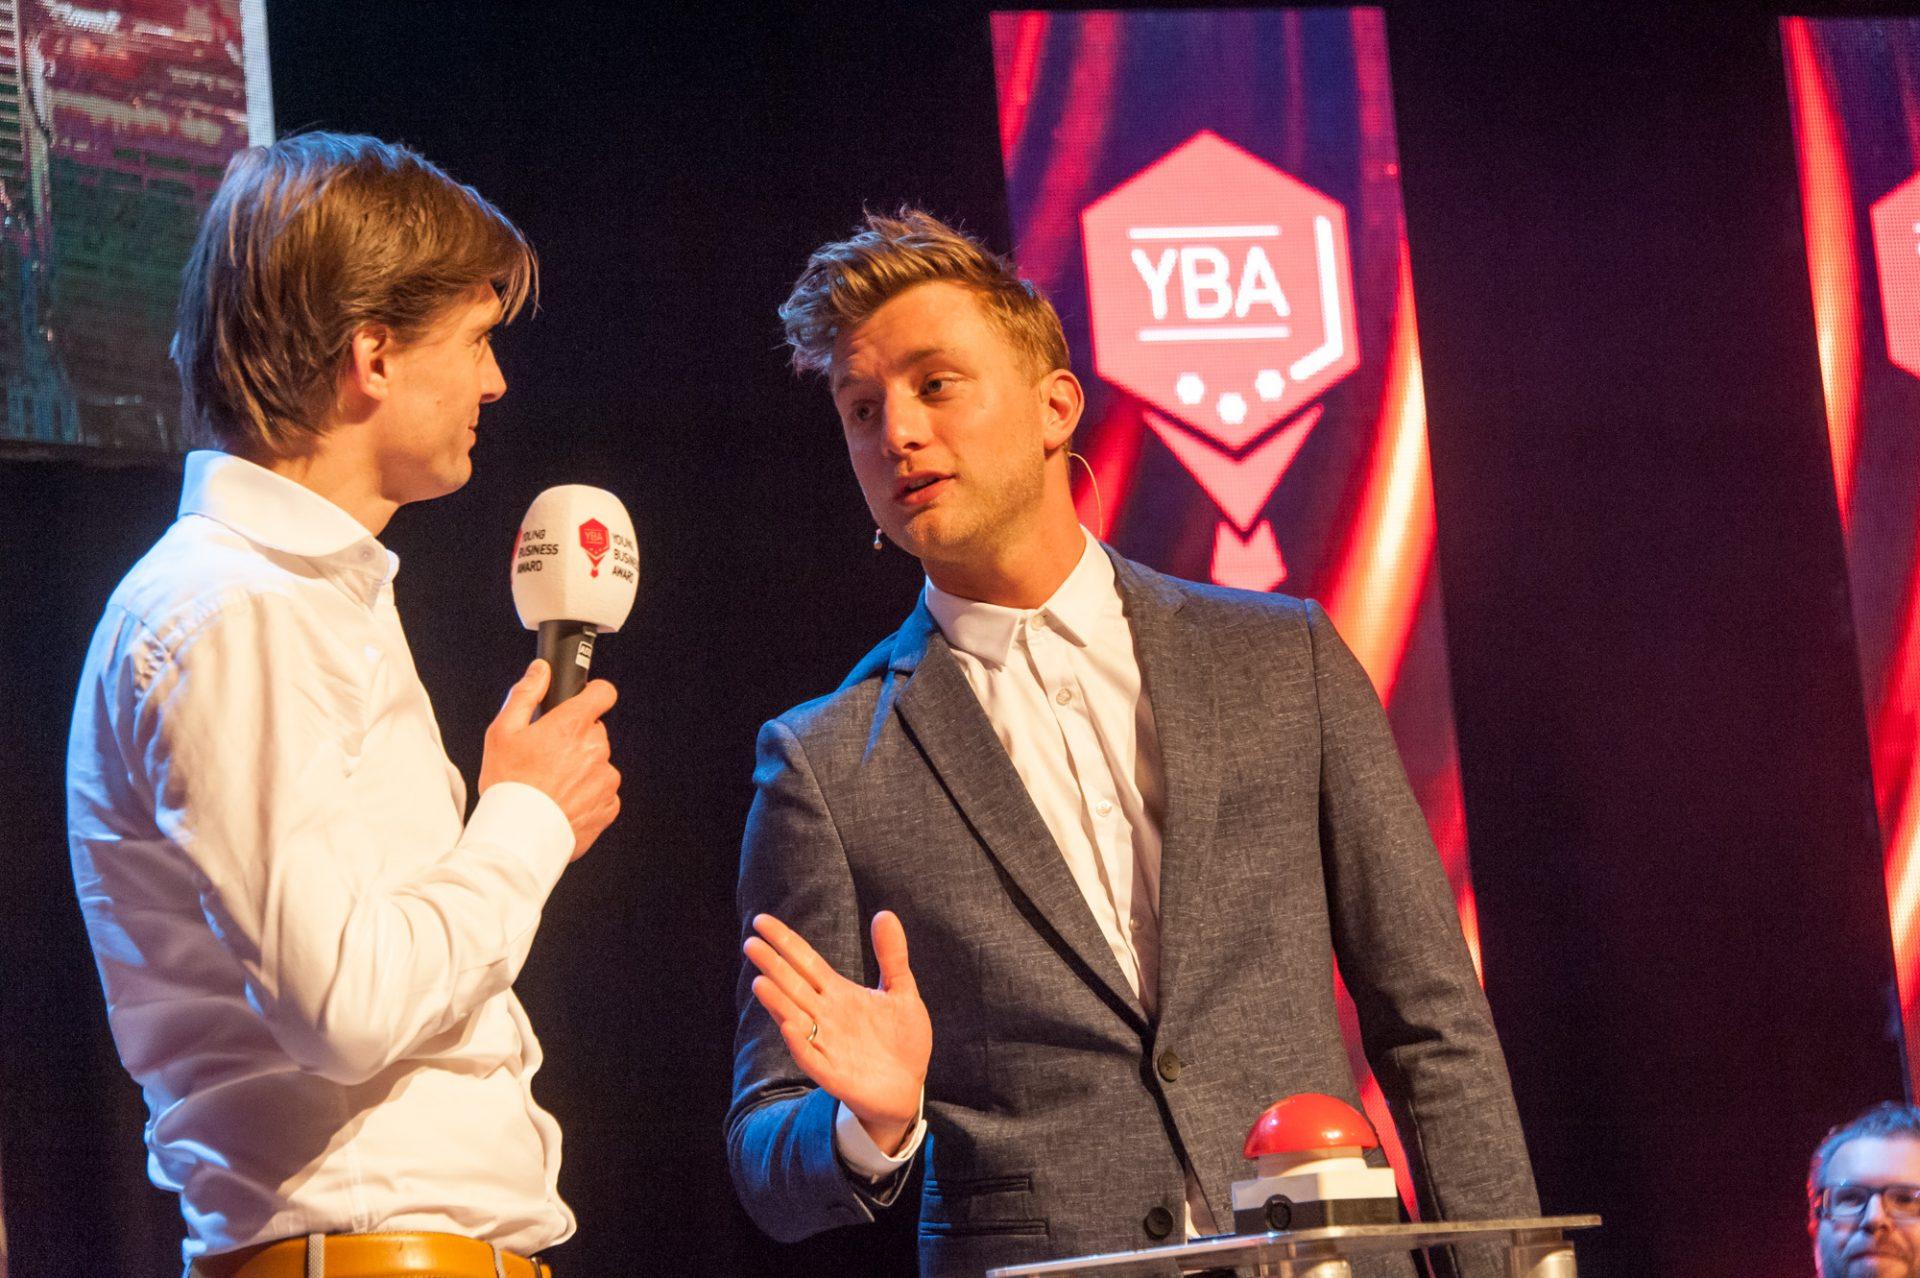 Pitch event Groningen